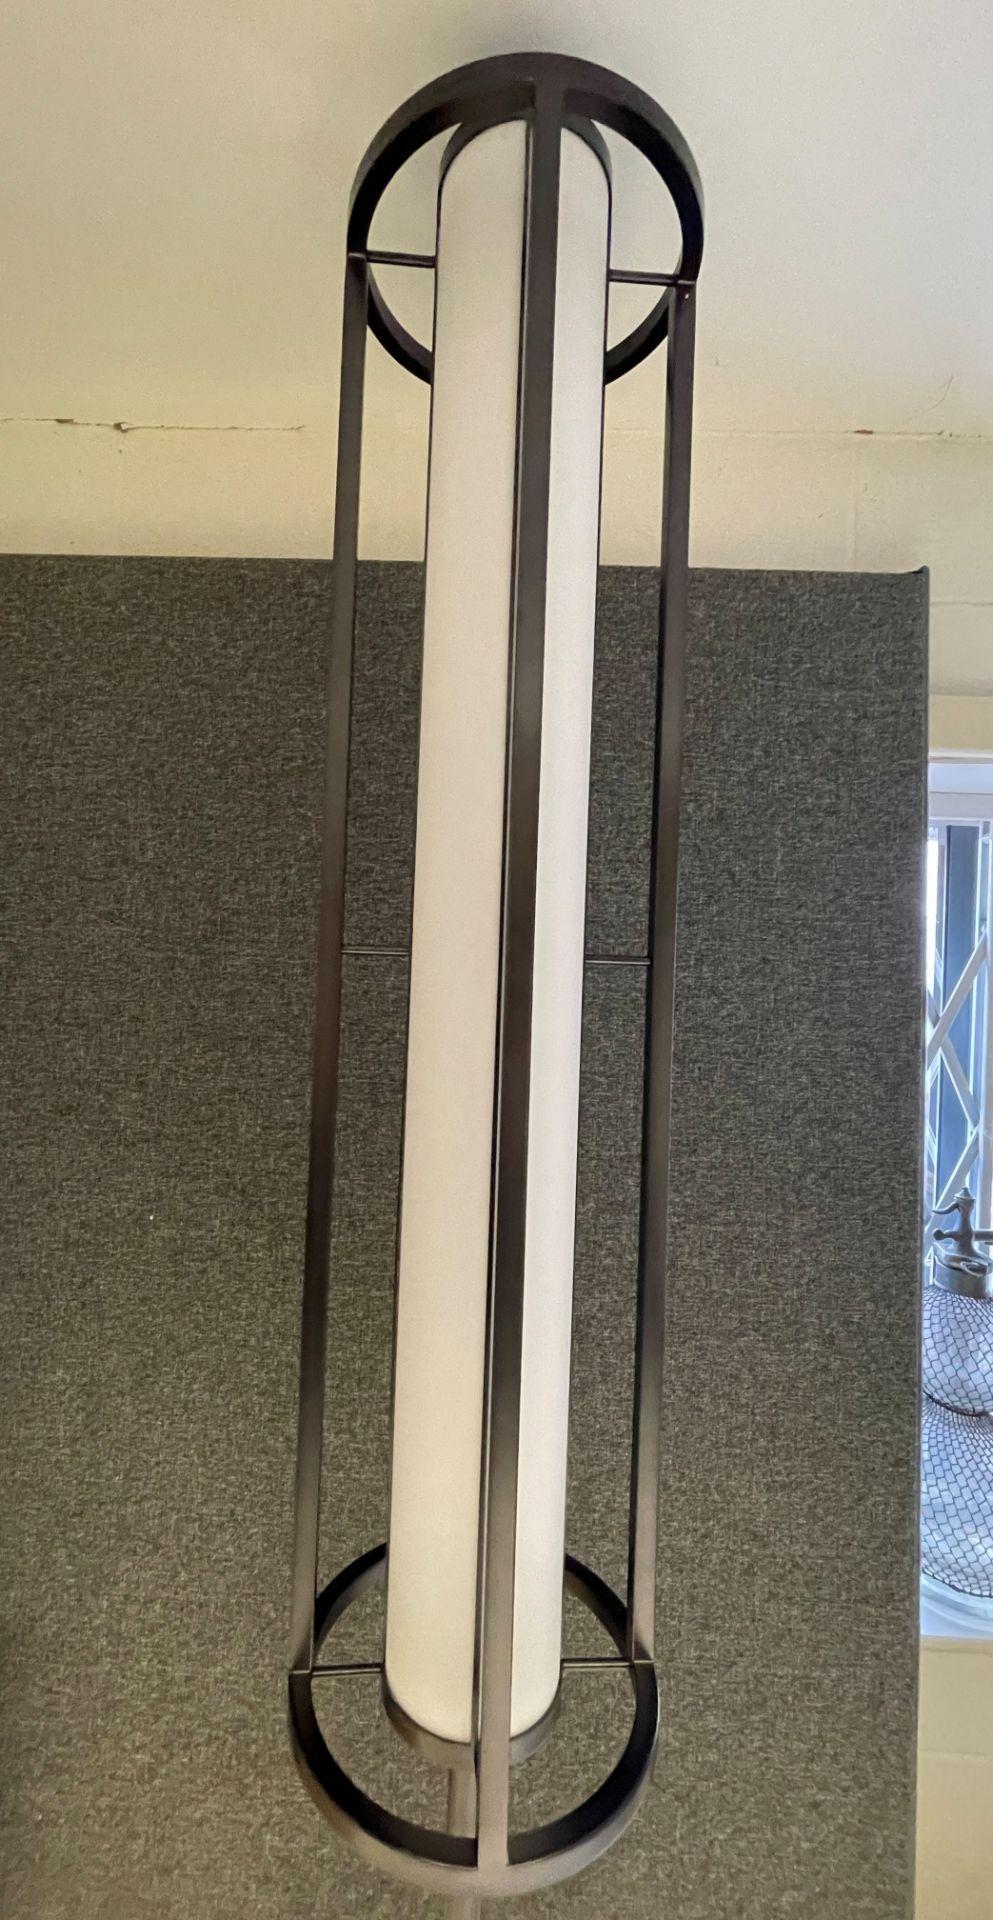 1 x Chelsom Art Deco Style Floor Lamp in Black/Bronze Height 161cm x 30cm Diameter - Ref: CHL197 - - Image 9 of 10